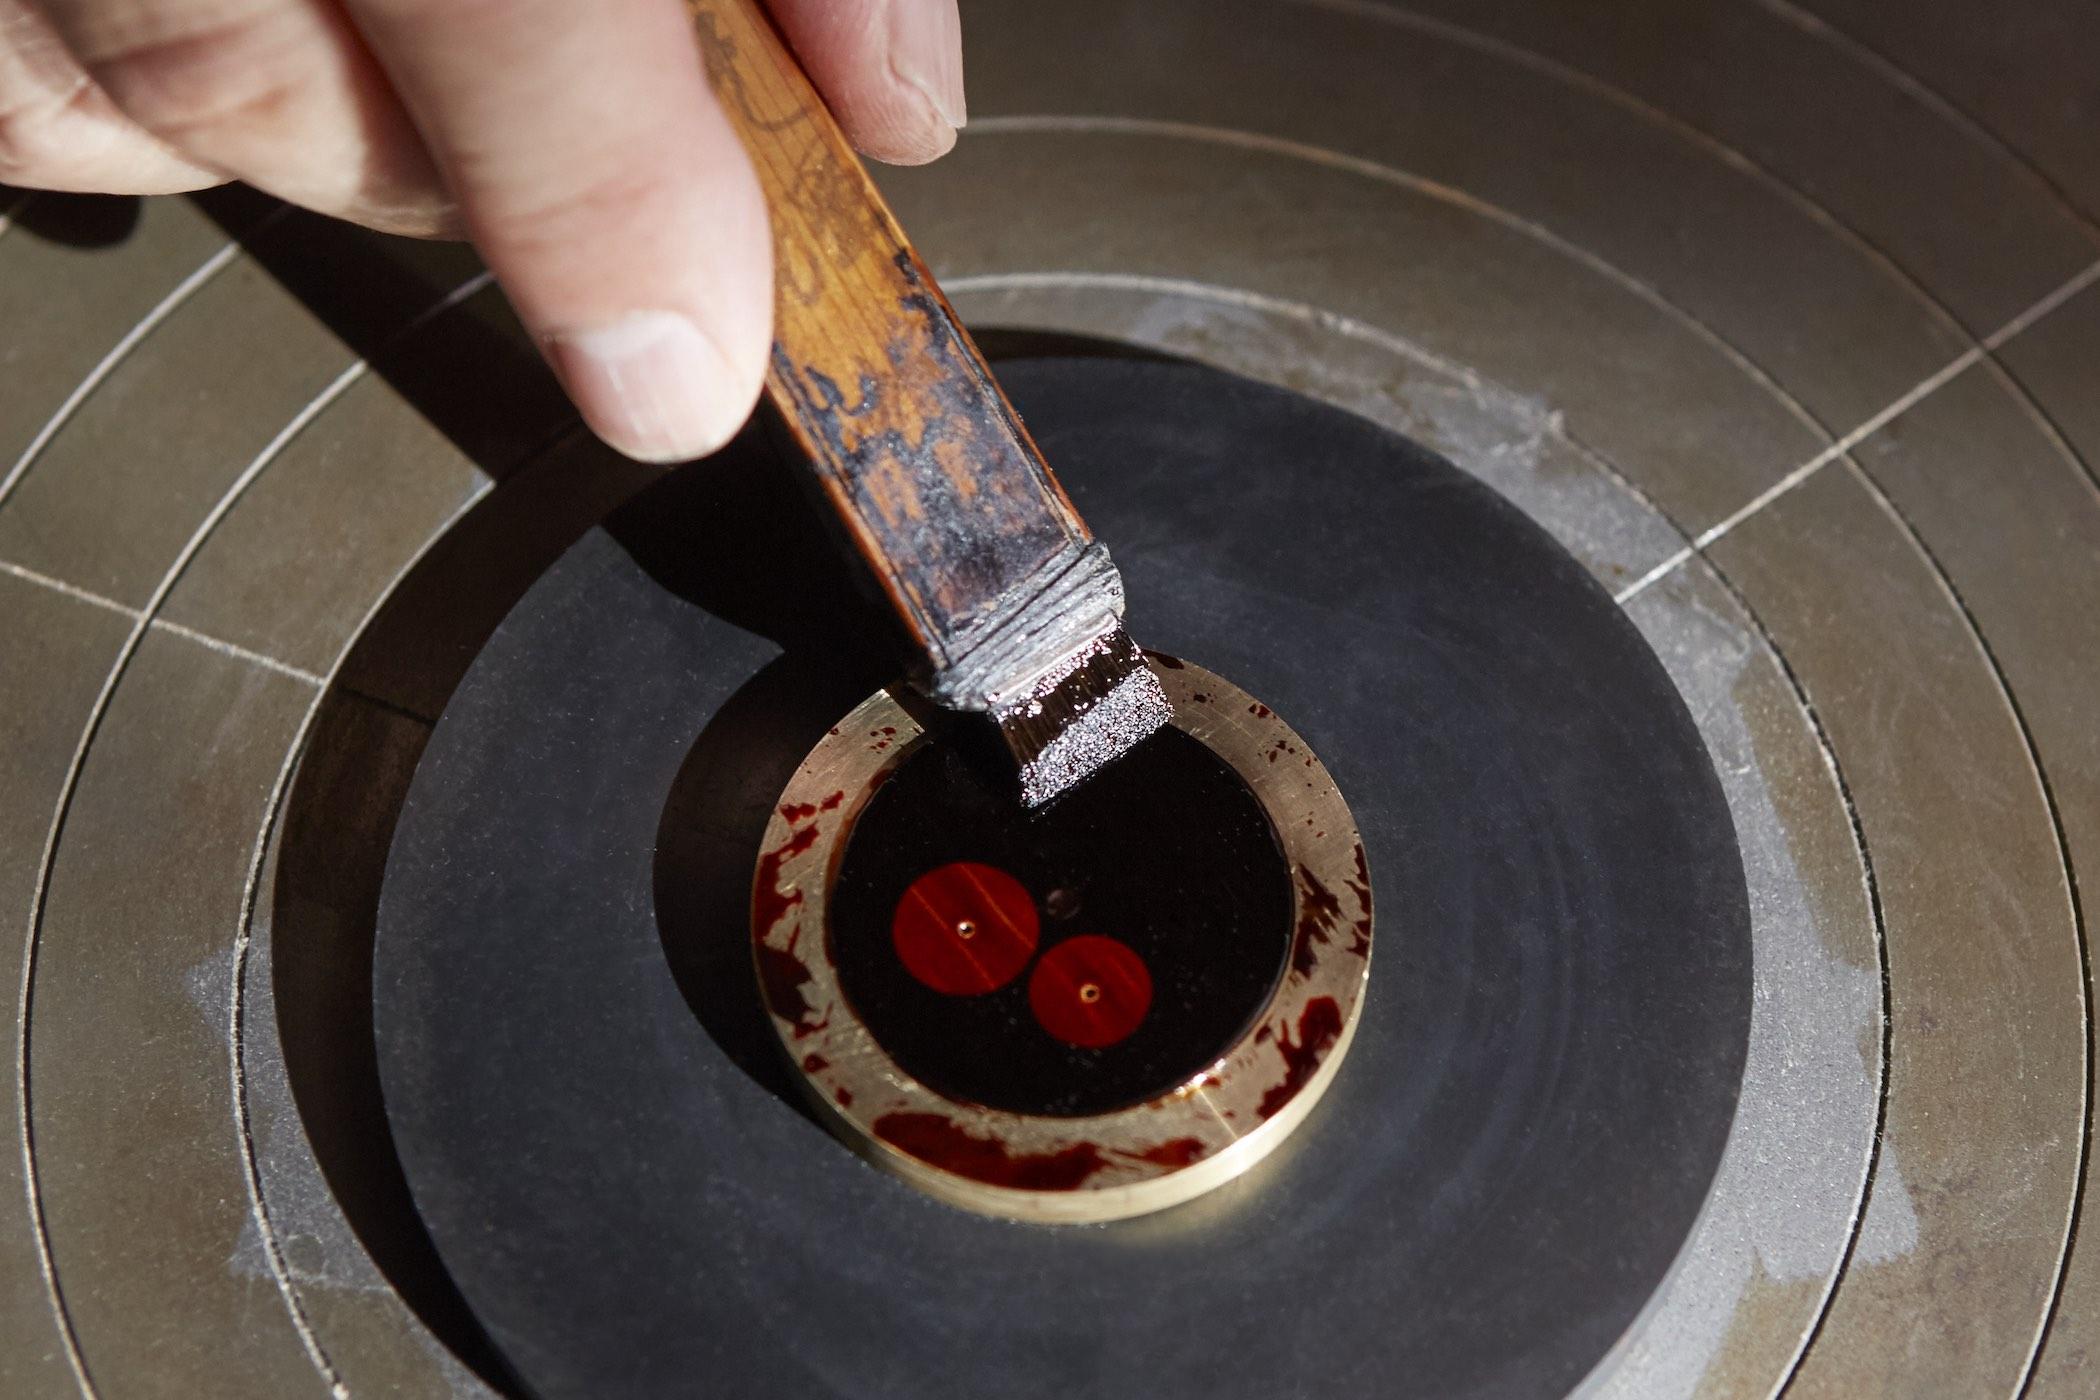 Seiko Presage Urushi Byakudan-nuri SPB085 - Urushi laqcuer applied by hand